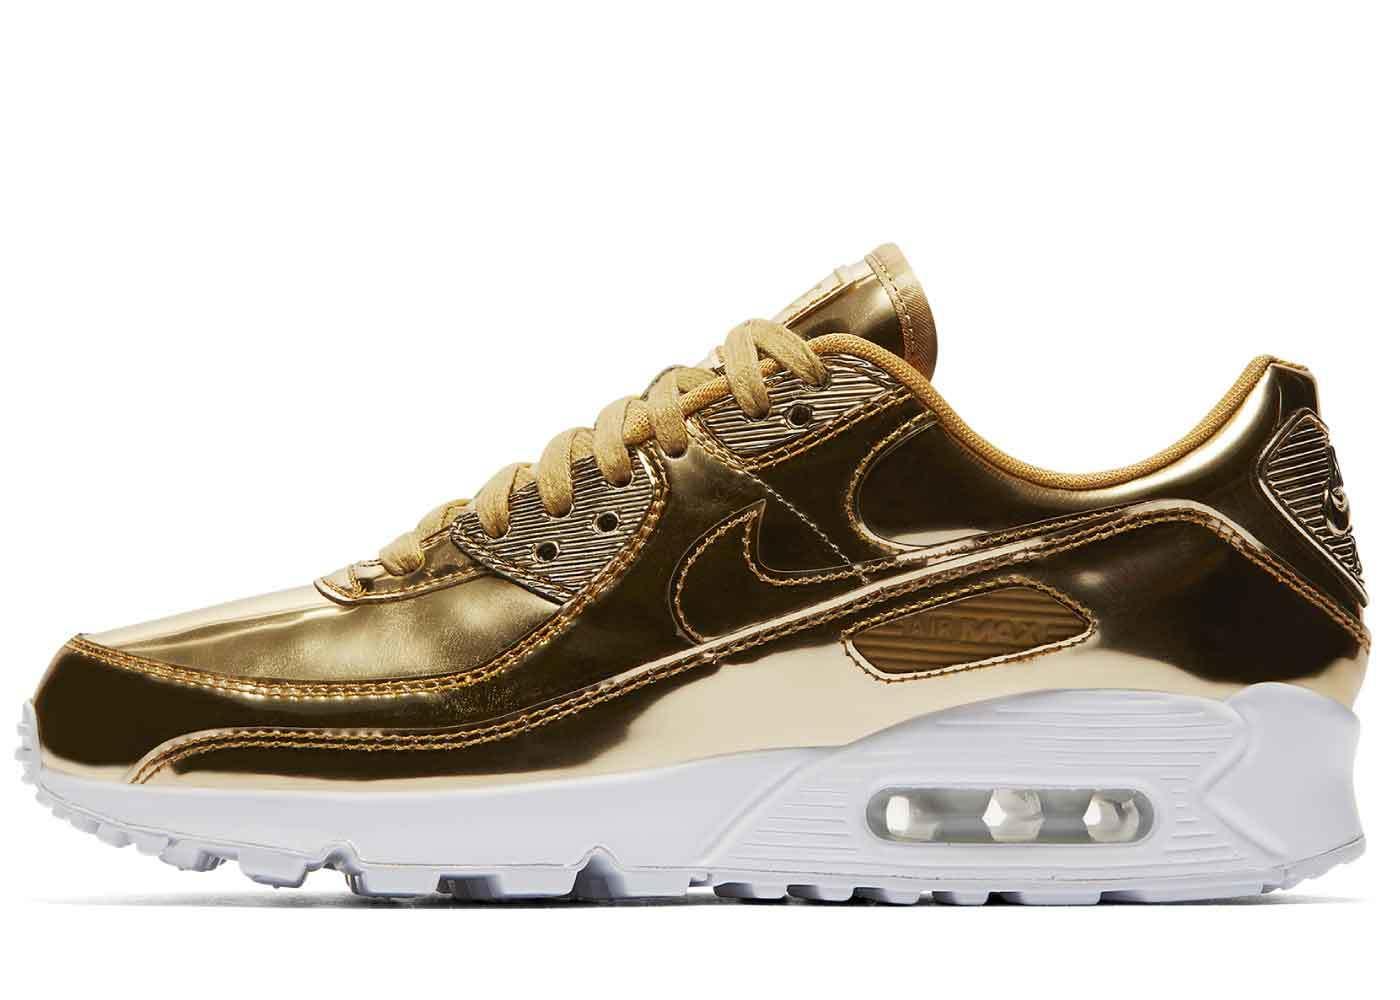 Nike Air Max 90 Metallic Gold Womensの写真